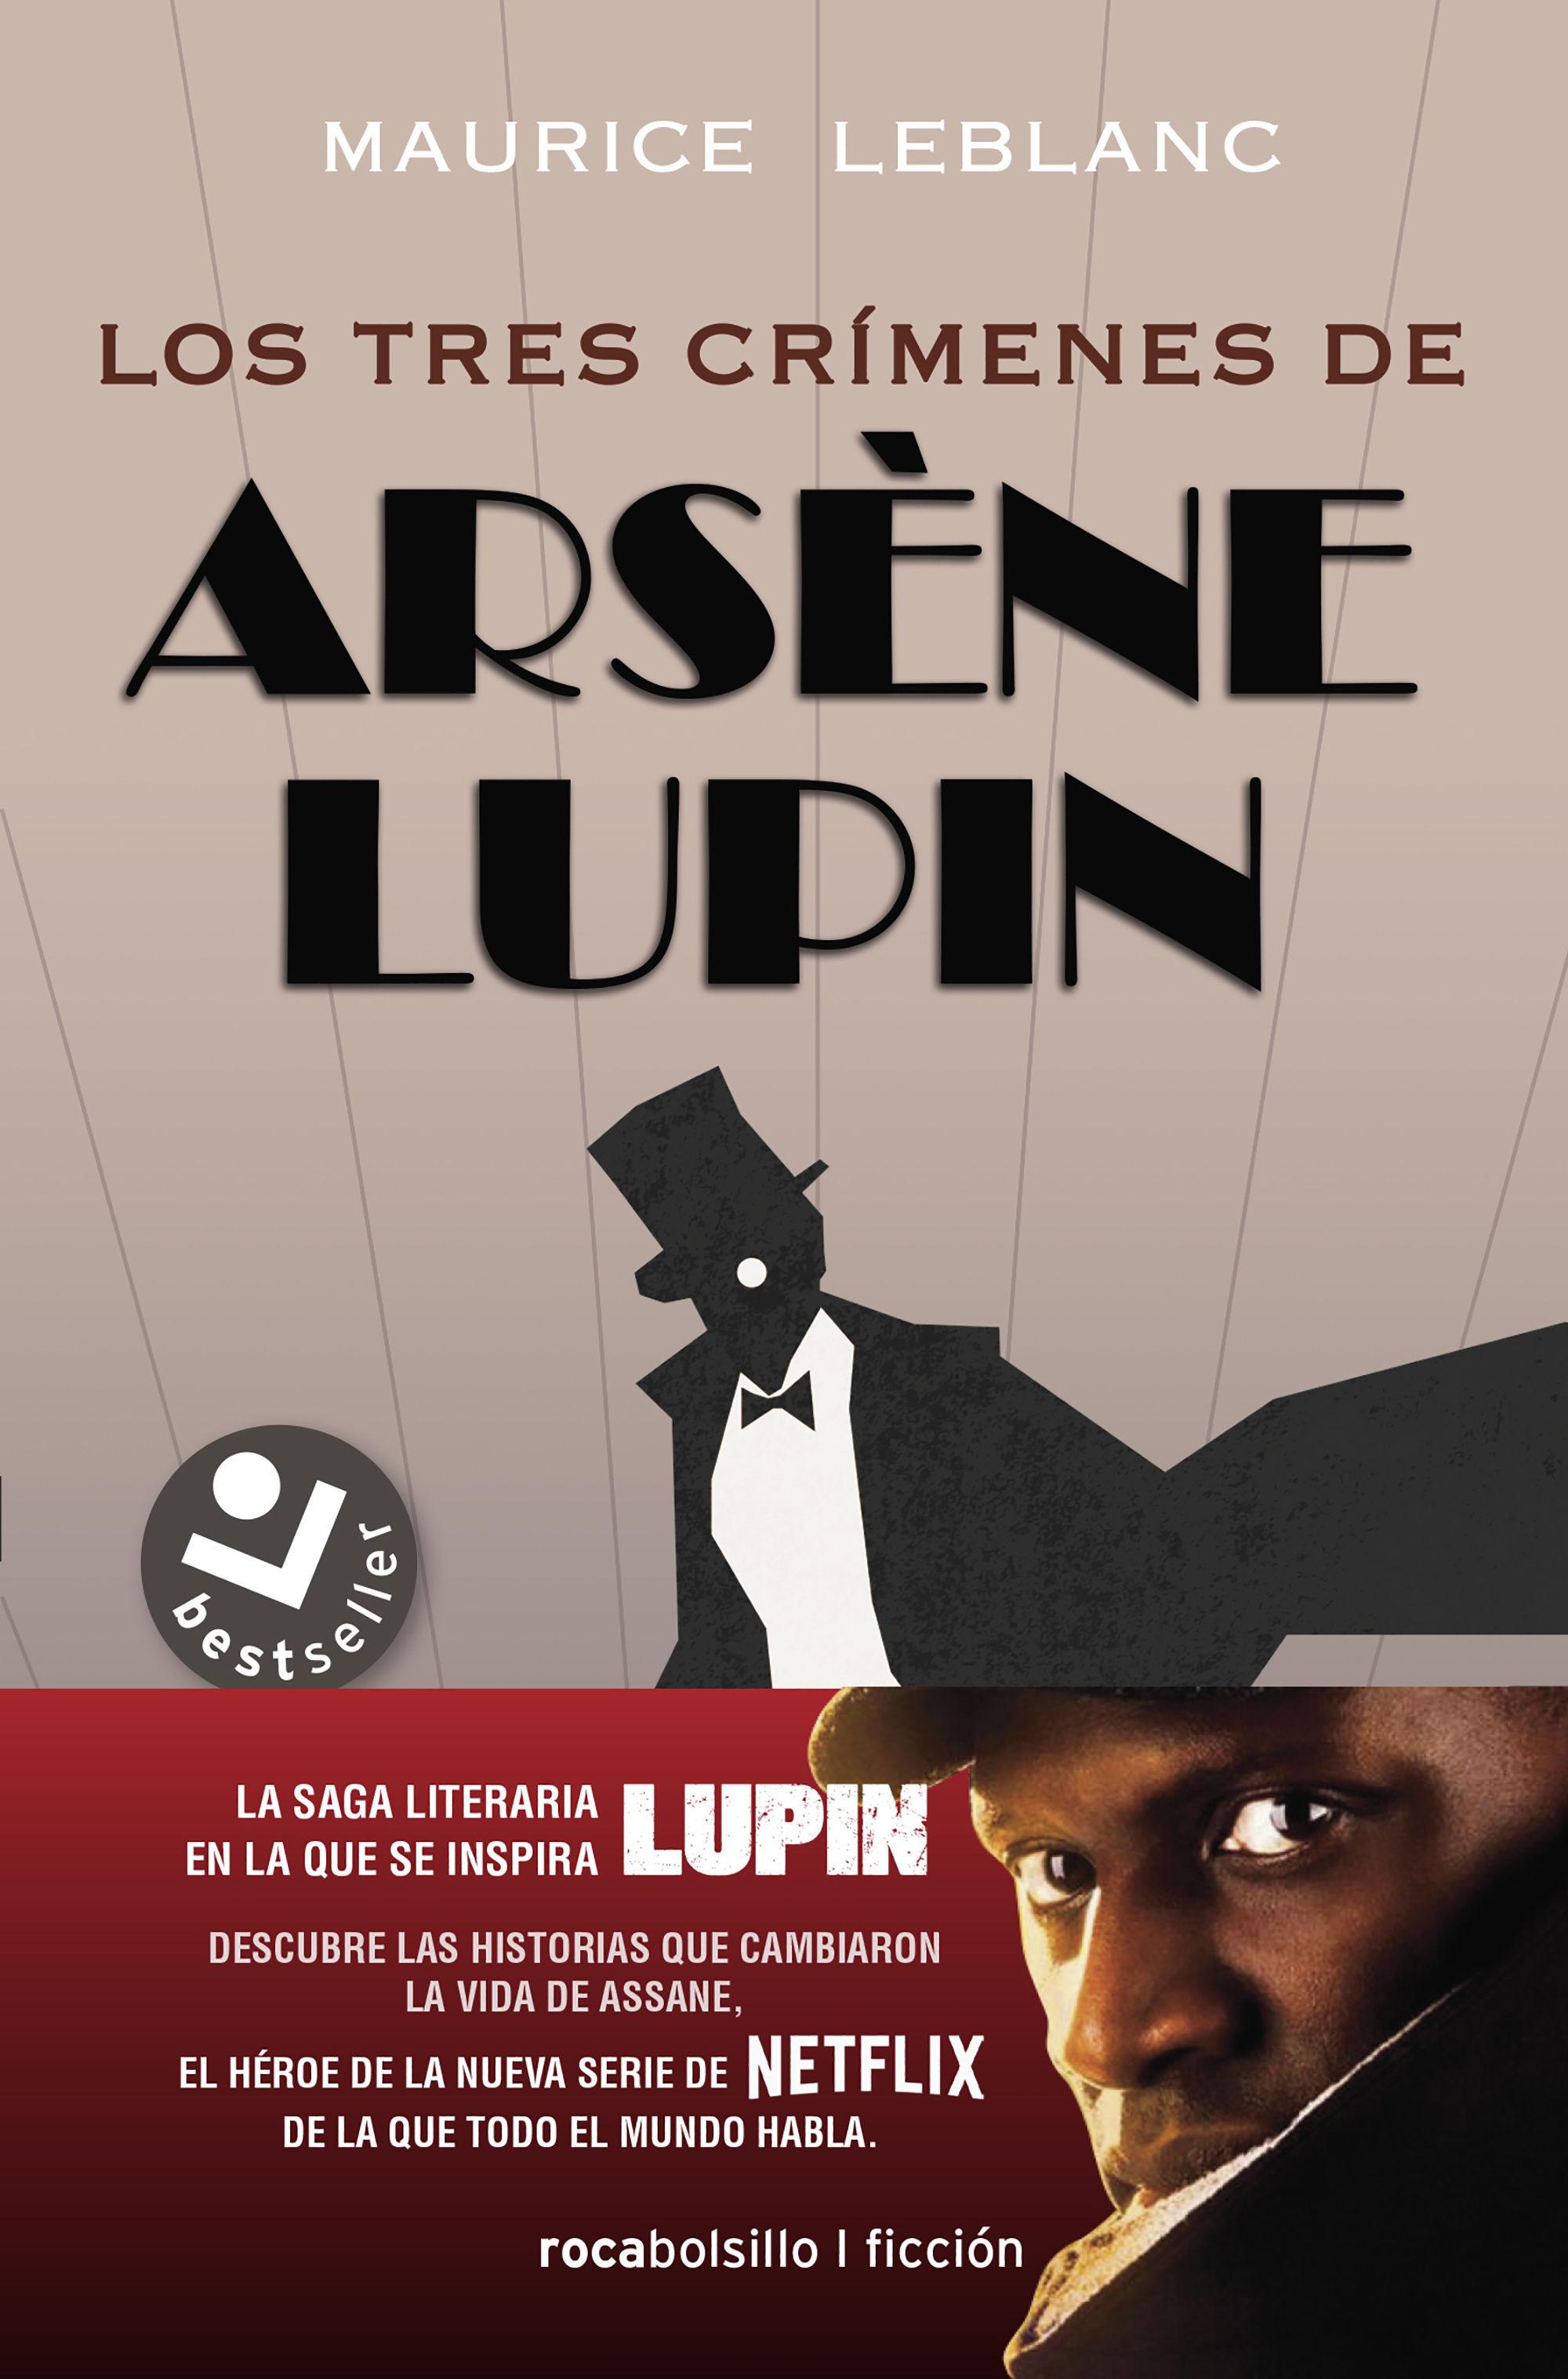 ARSENE LUPIN LOS TRES CRÍMENES DE ARSÈNE LUPIN